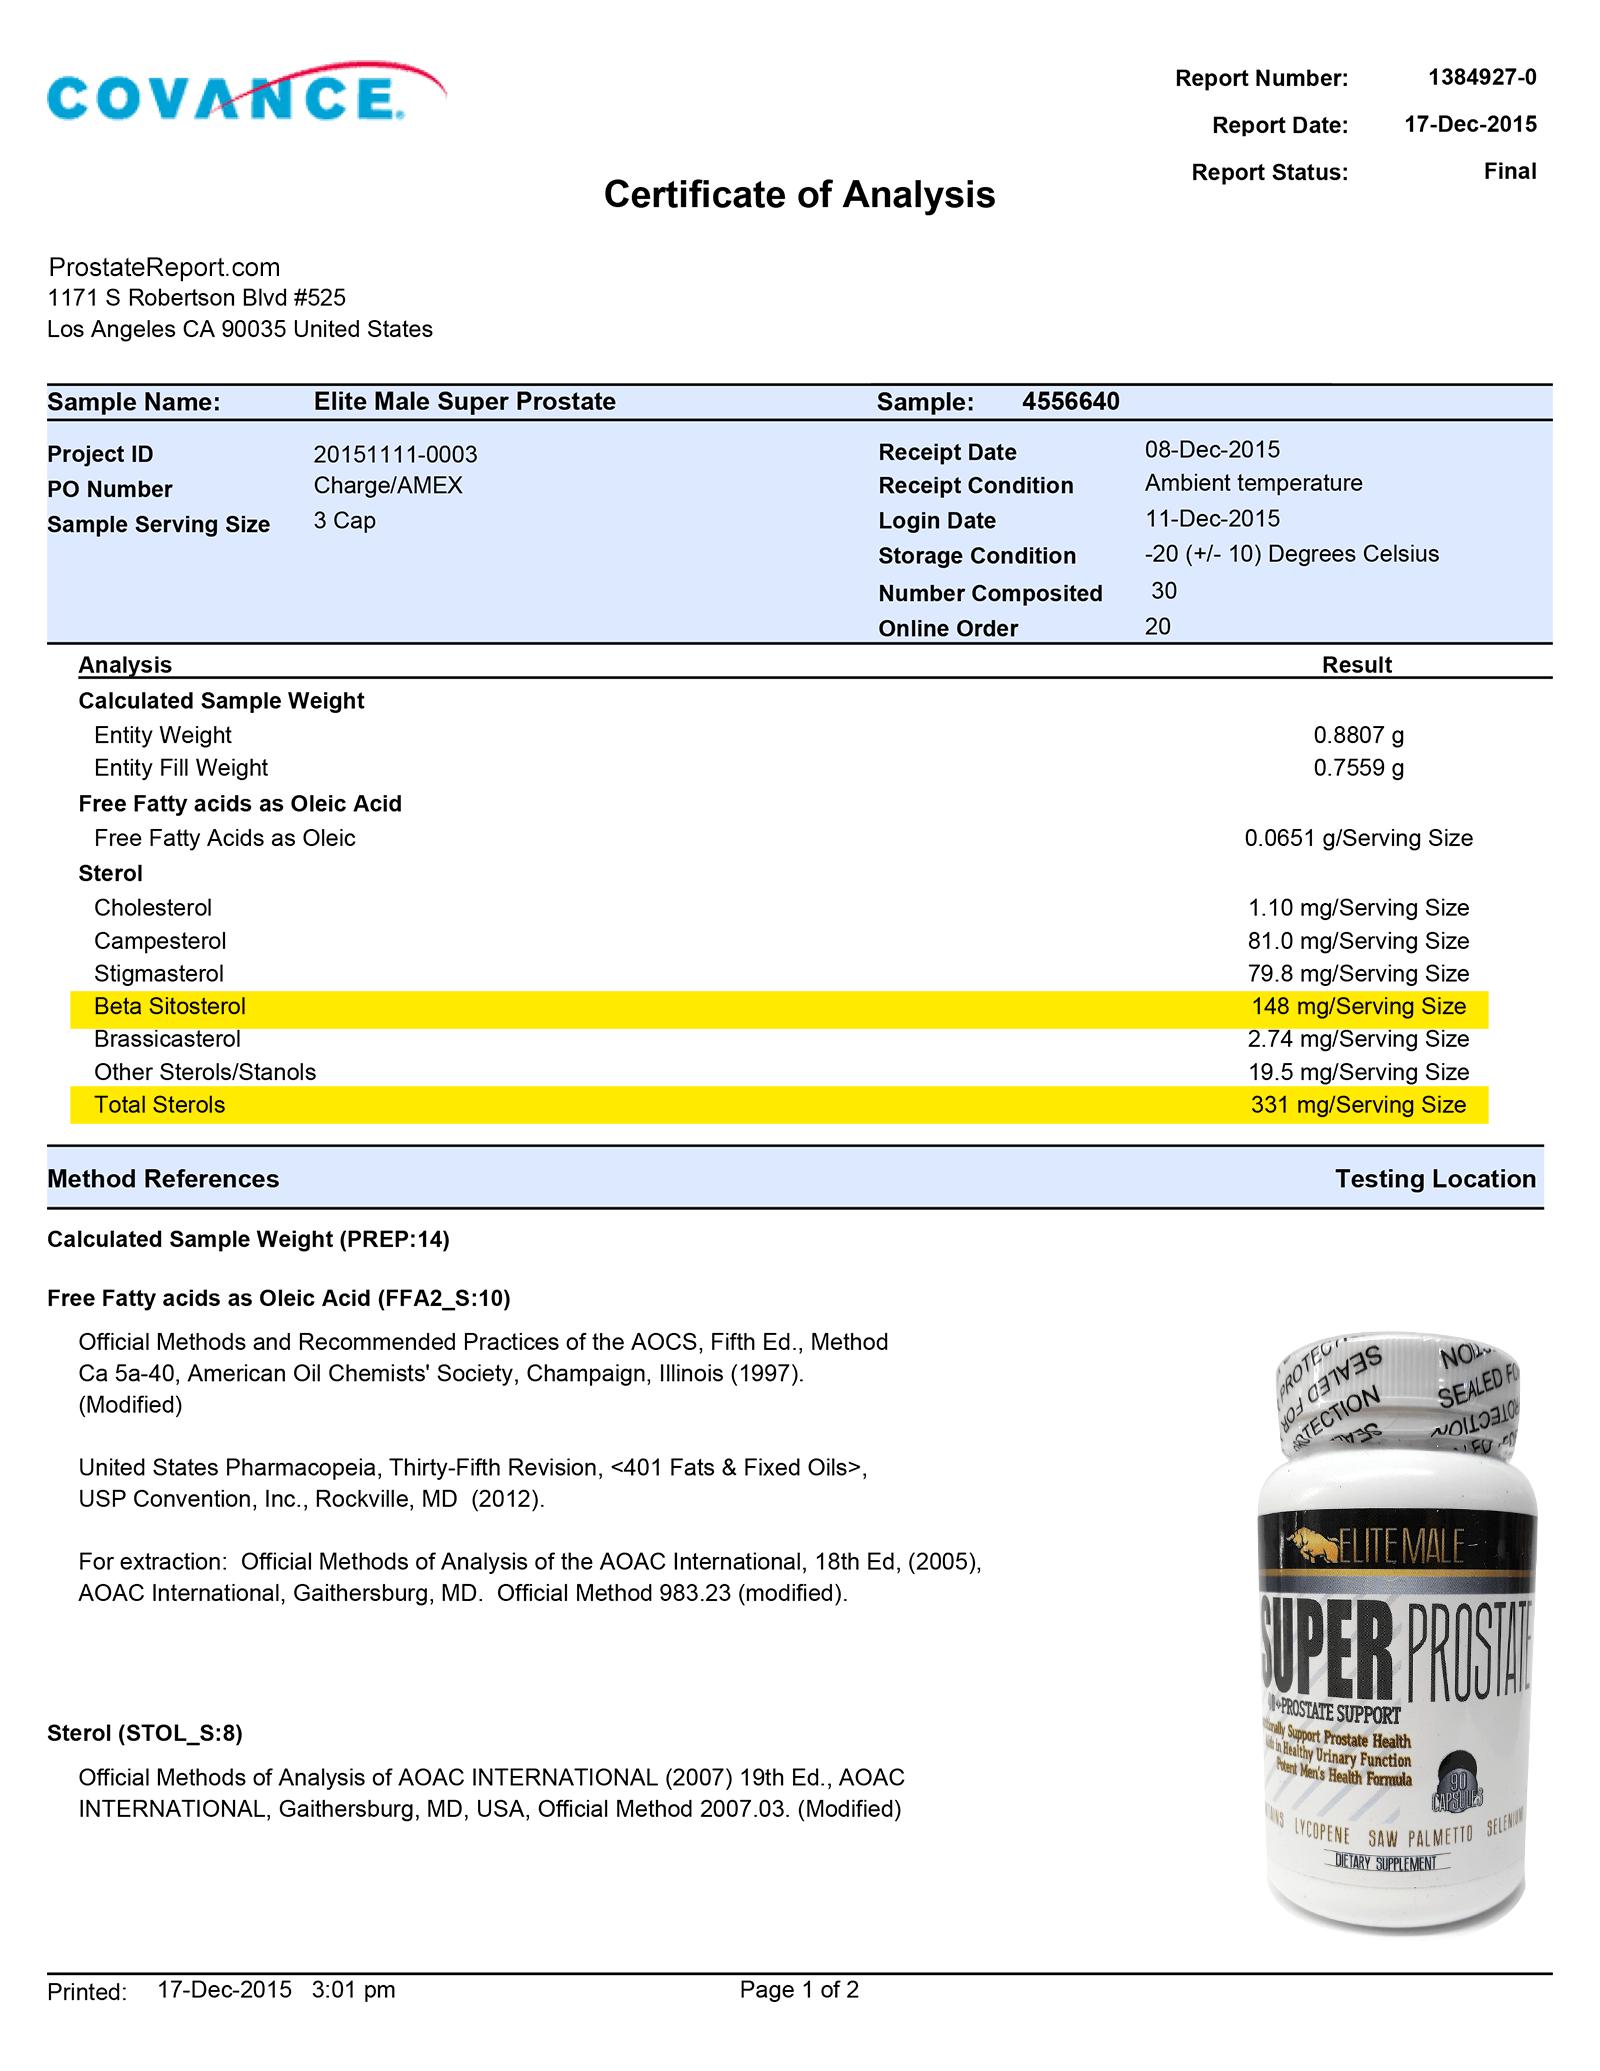 Super Prostate lab report